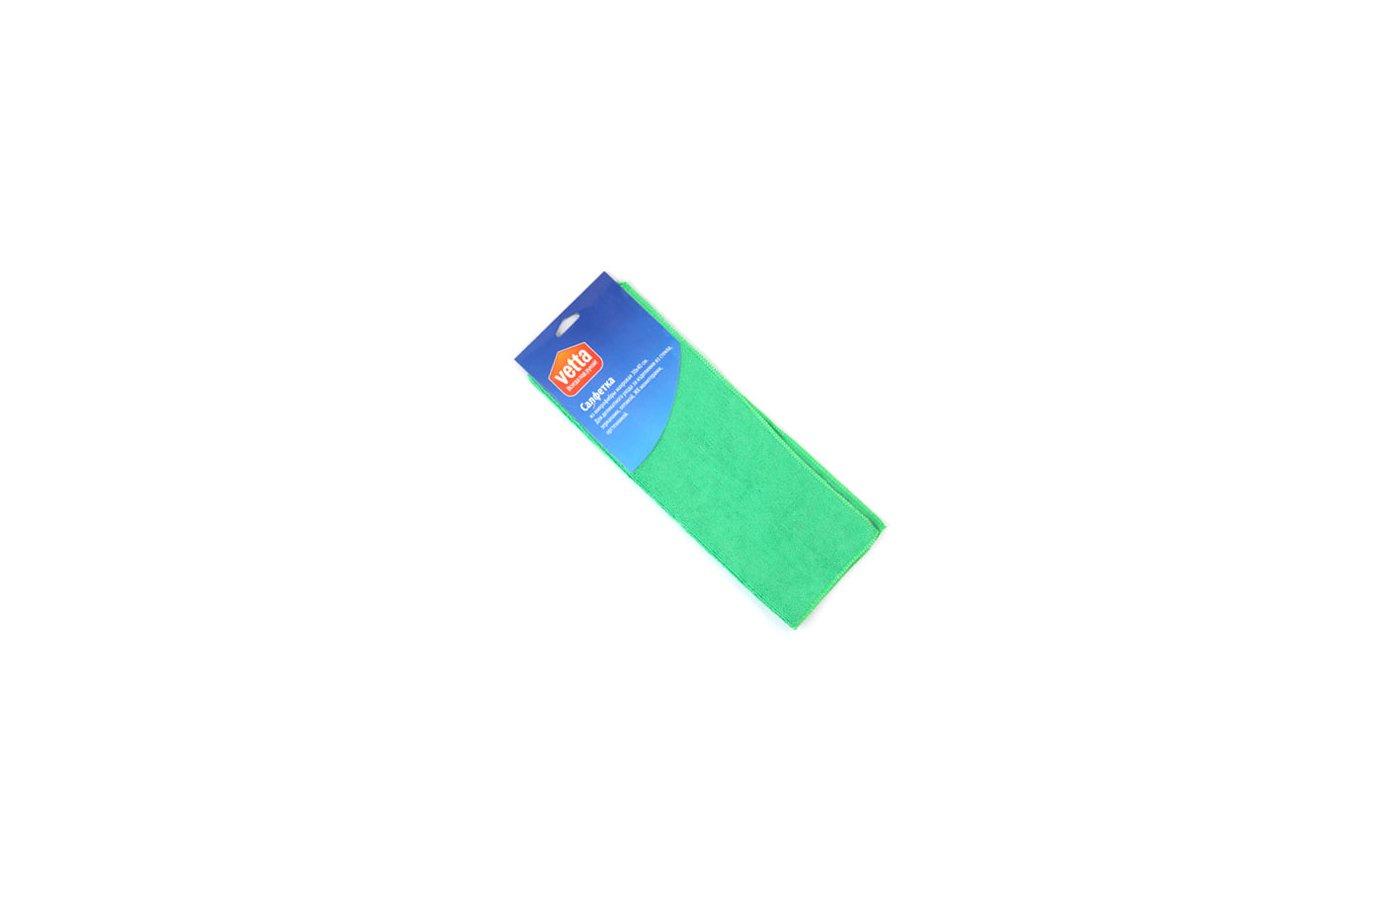 Средсва по уходу за кухней VETTA 448-008 Салфетка микрофибра впитывающая